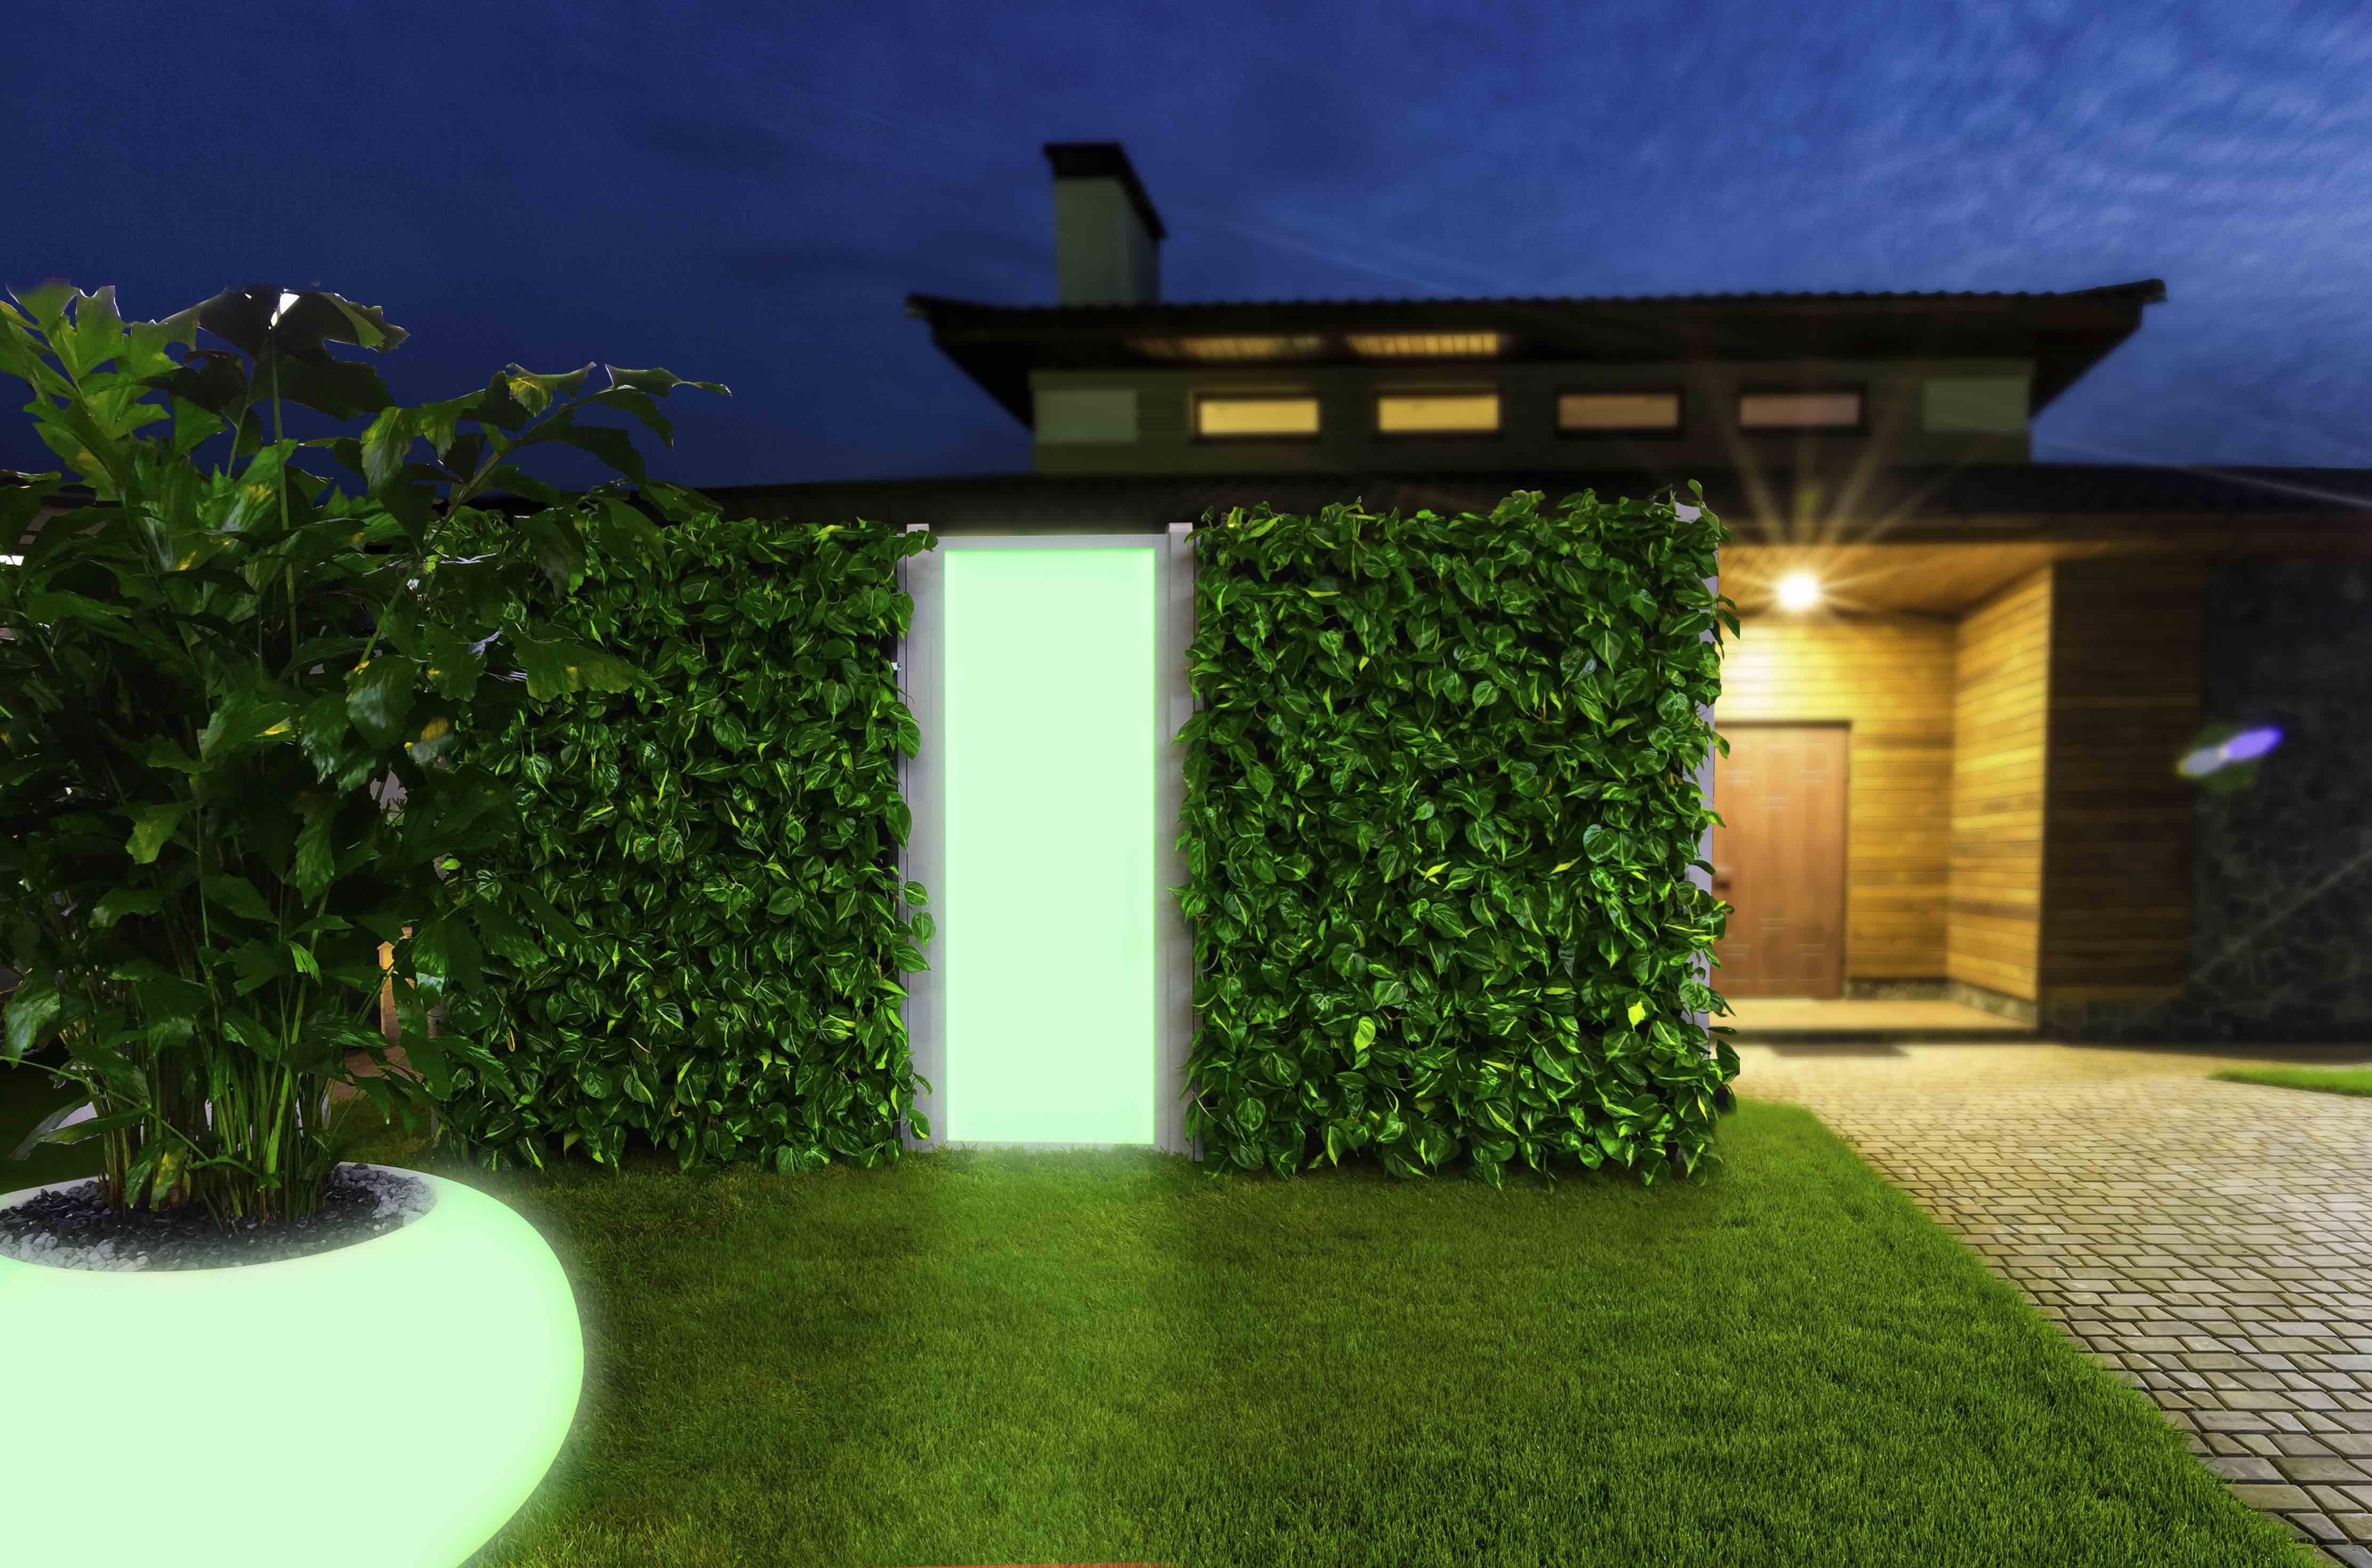 MiBaveno Living Fence verticale groenwand met geïntegreerd LED-paneel in tuinwand.